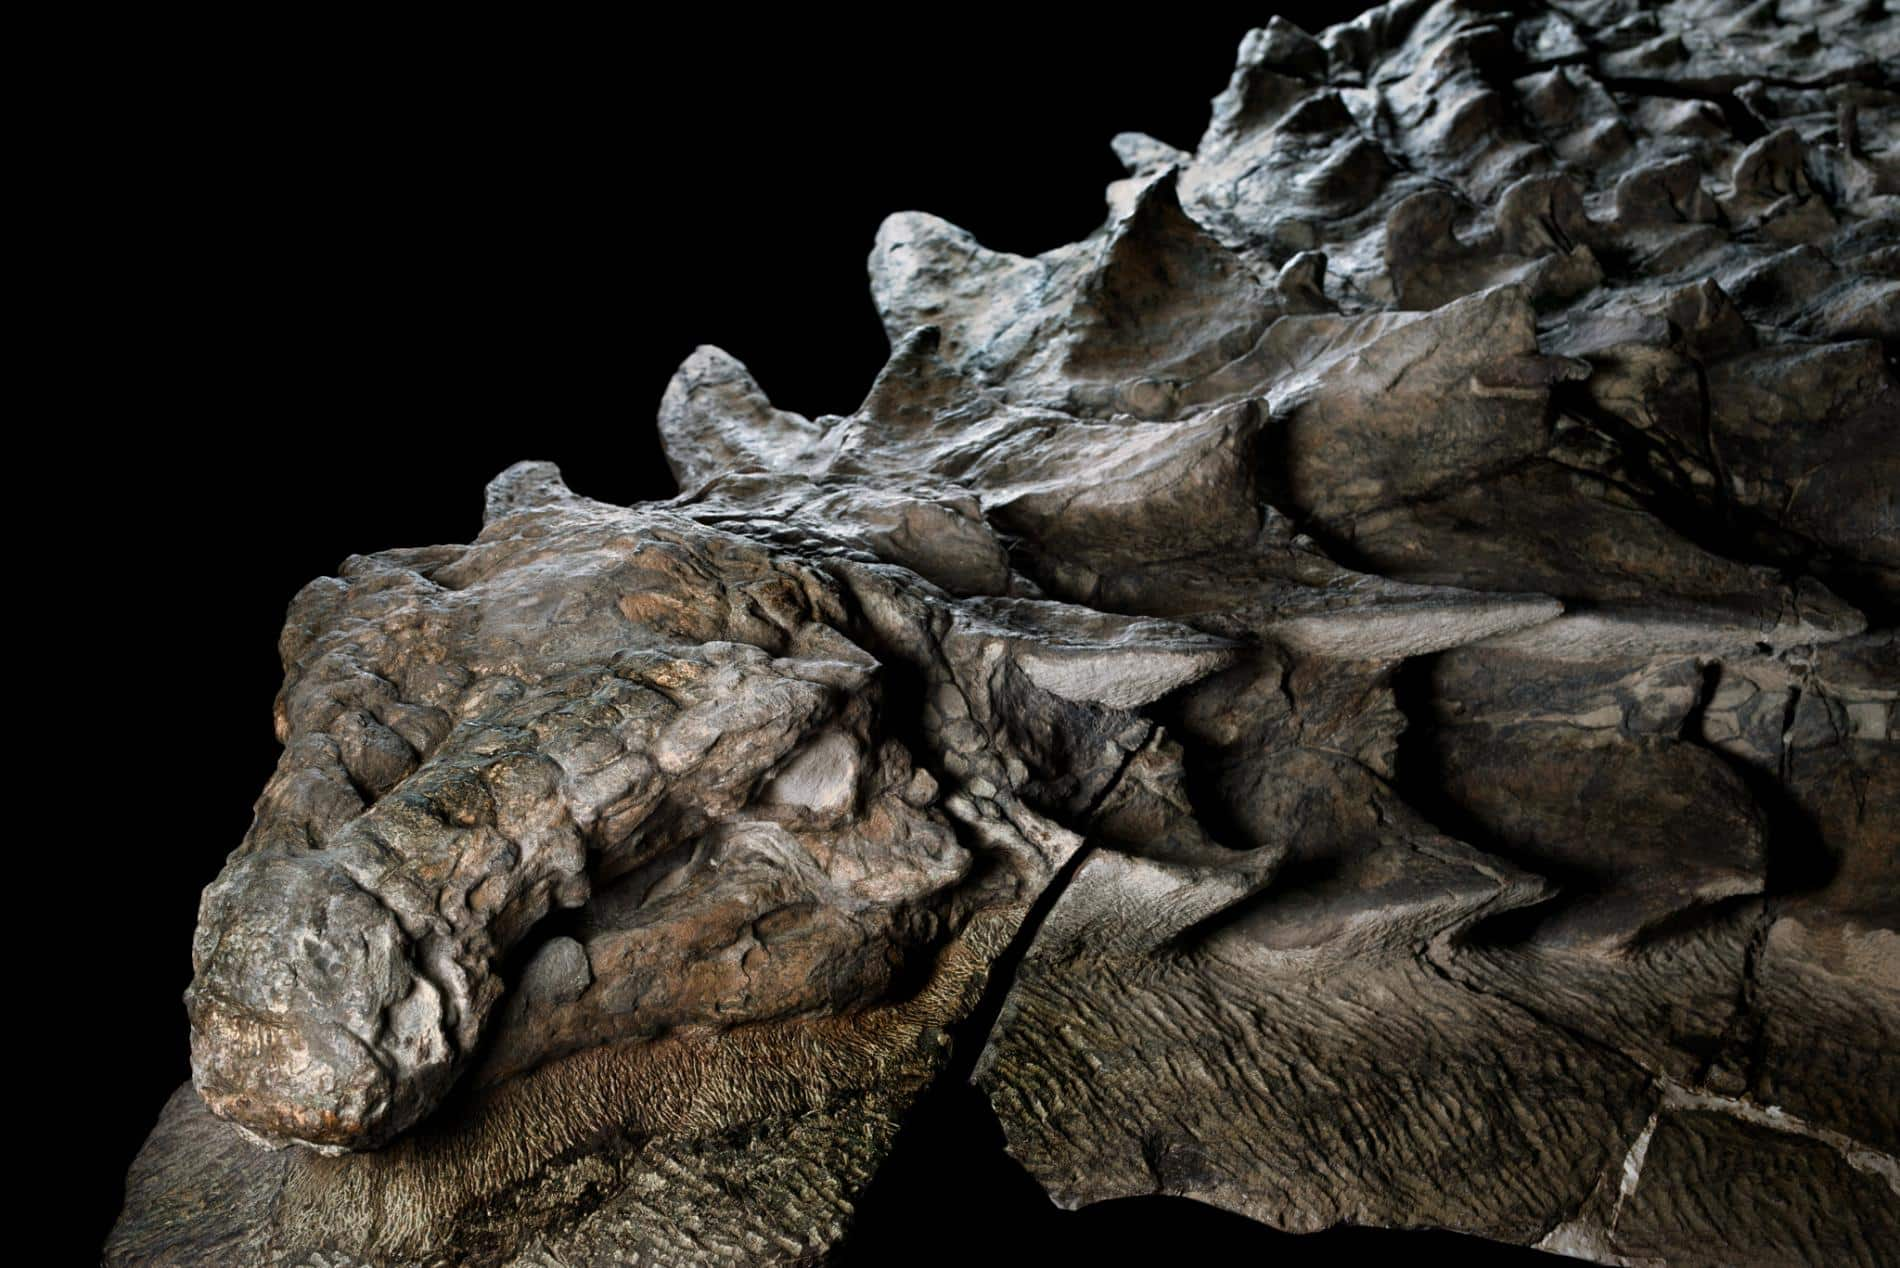 nodosaur-fossil-canadian-mine-face.adapt_.1900.1